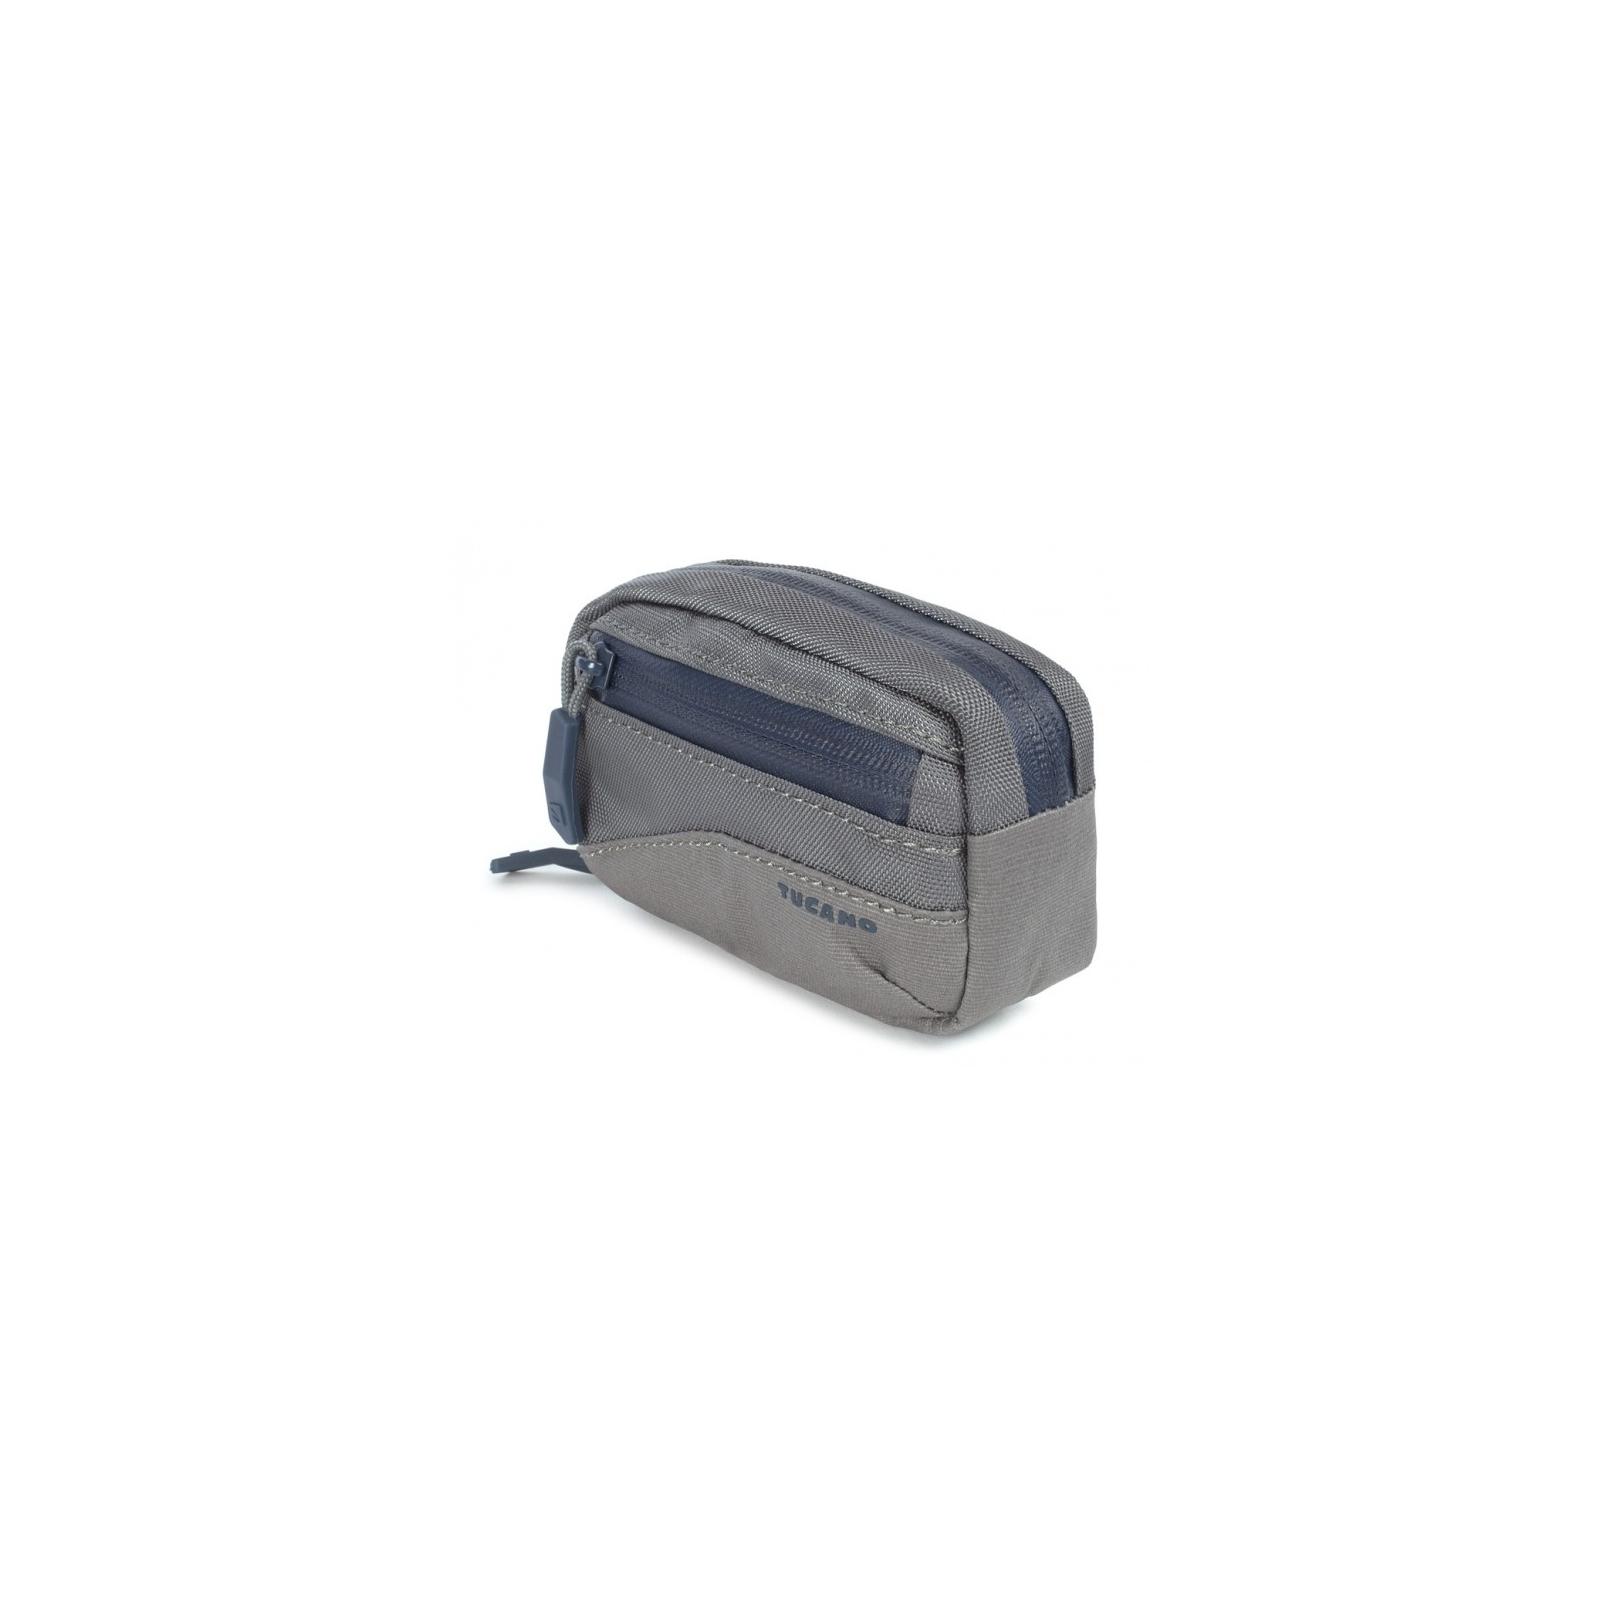 Фото-сумка Tucano TECH Plus Digi Bag S /Grey (CB-TP-S-G) изображение 2